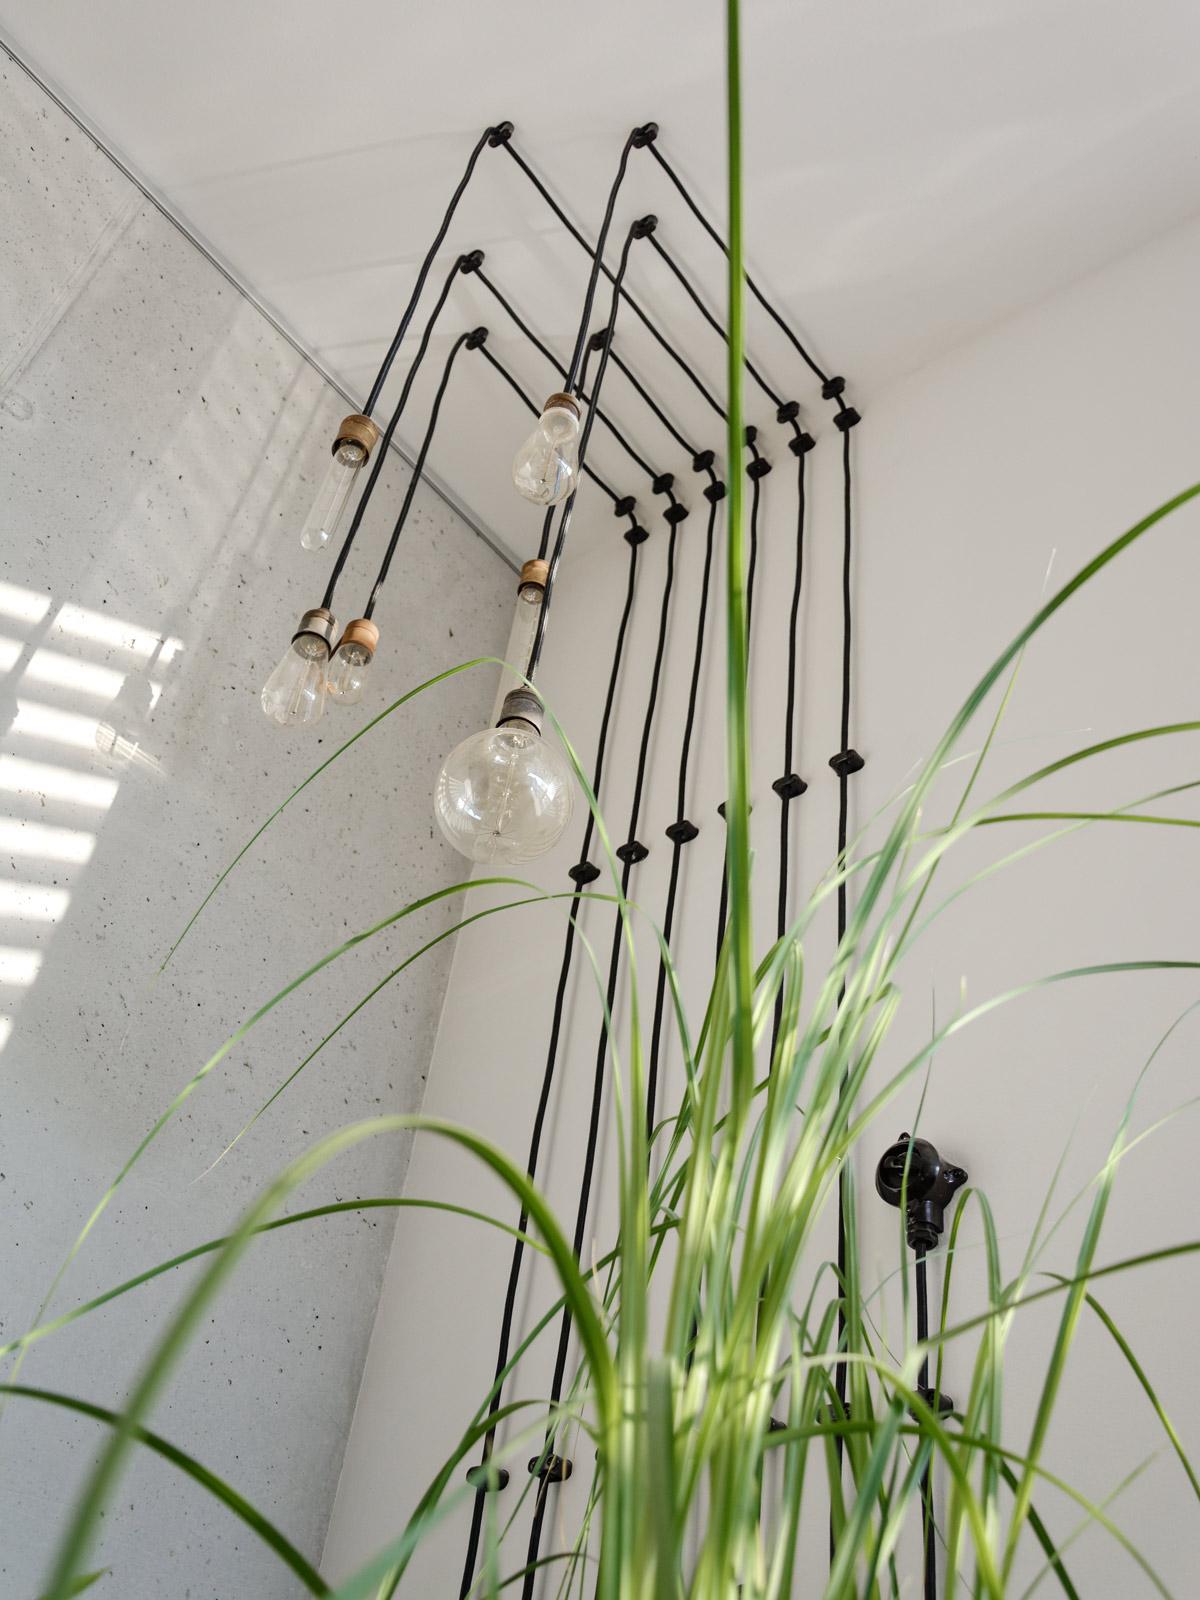 beleuchtung-mit-kohlefadengluehlampen